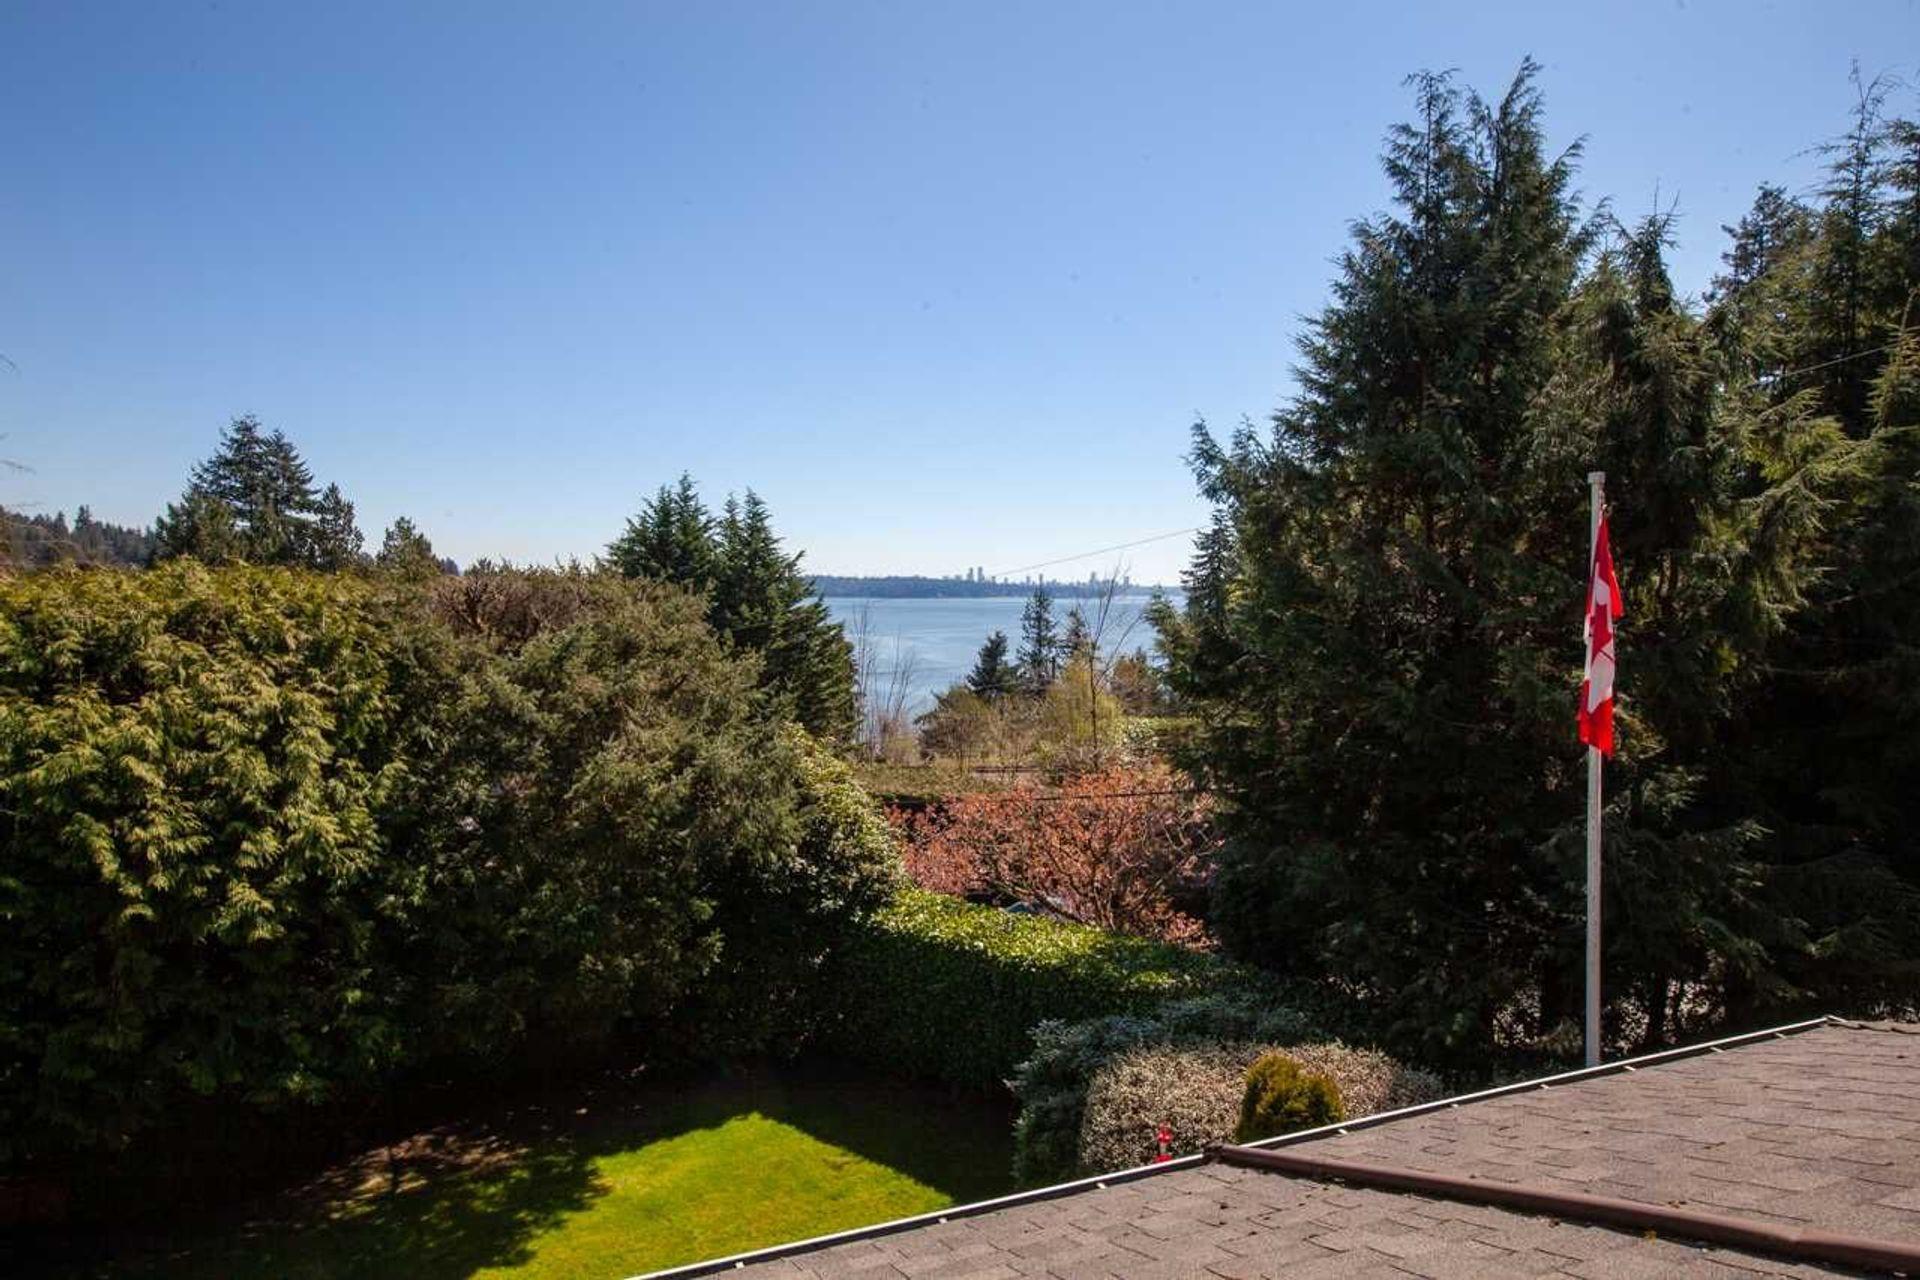 412-hillcrest-street-westmount-wv-west-vancouver-15 at 412 Hillcrest Street, Westmount WV, West Vancouver